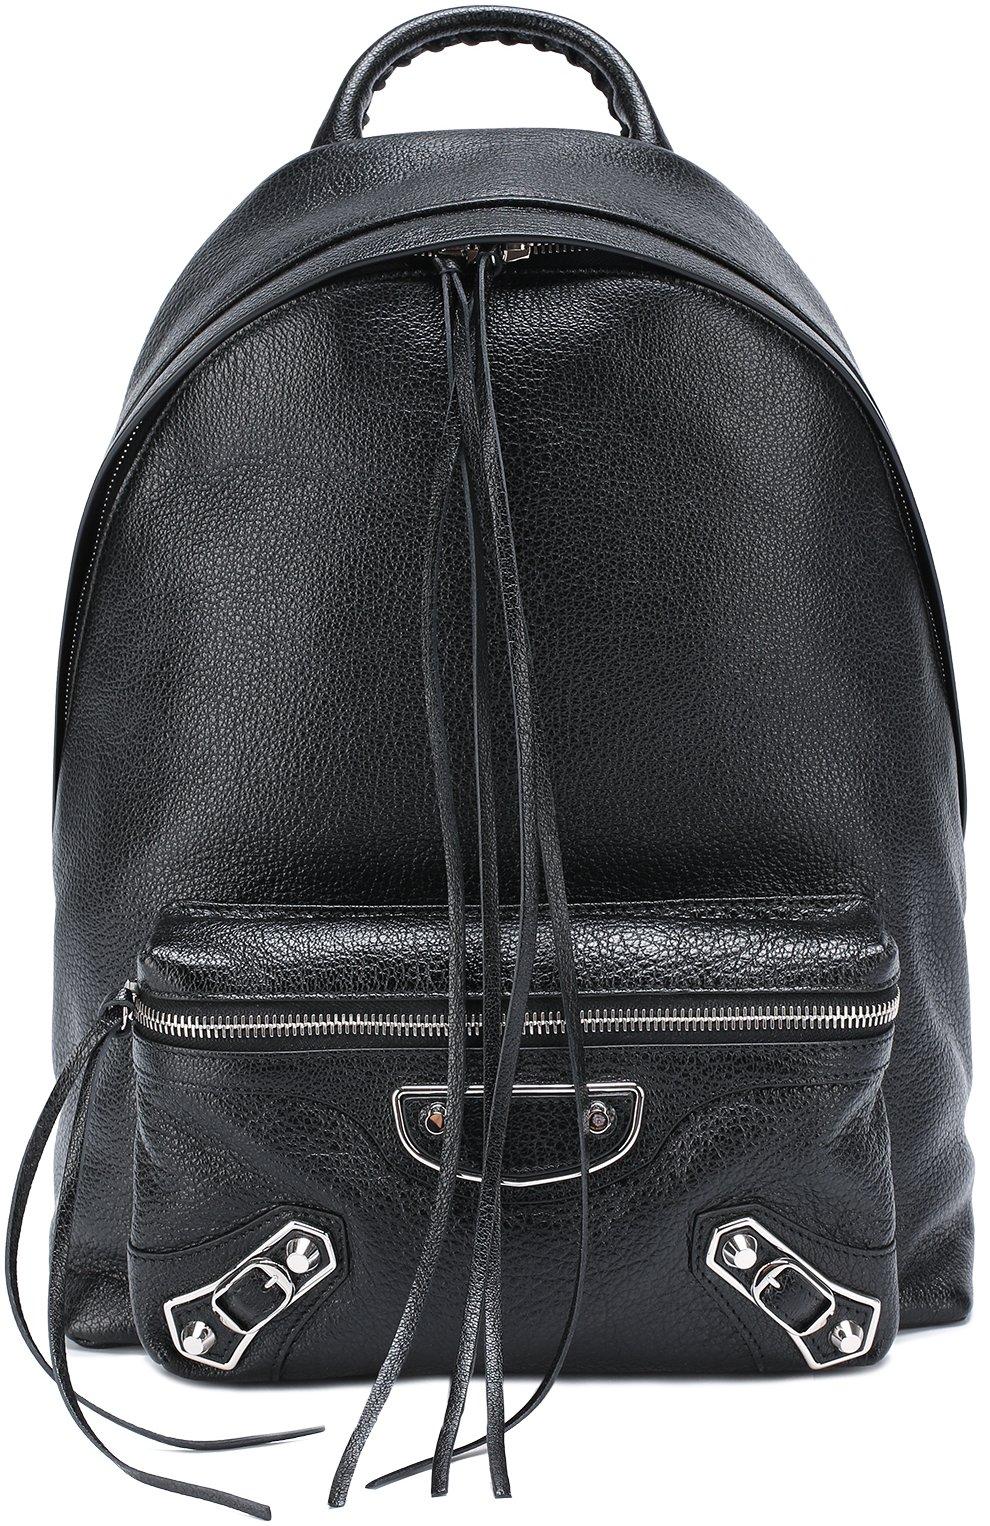 Кожаный рюкзак Metallic Edge | Фото №1